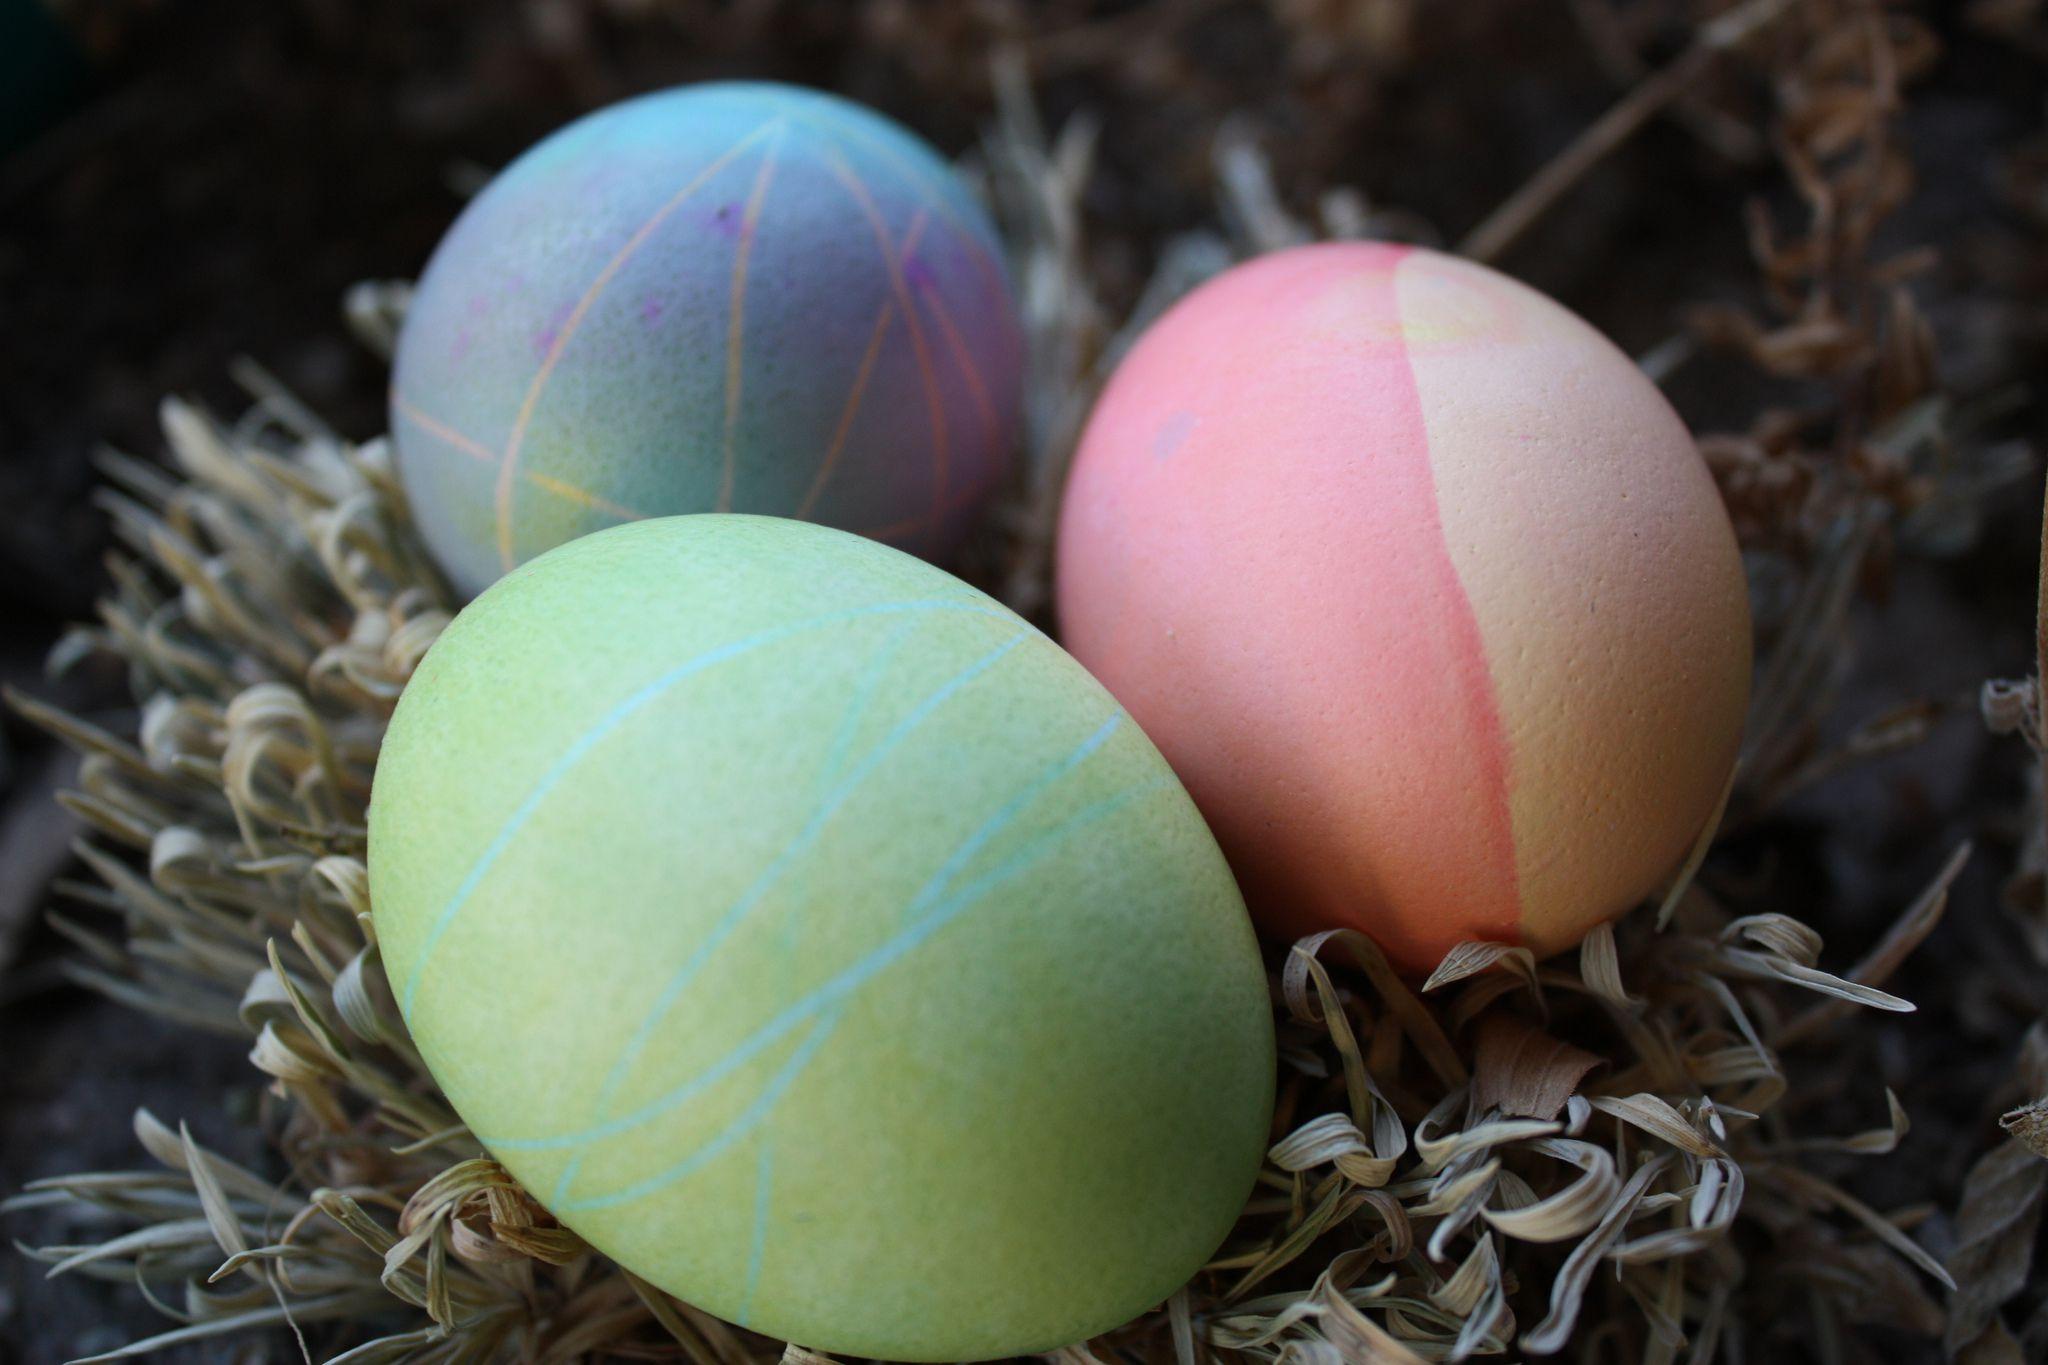 Bu All Dogal Easter Egg Boyalar Yapmak Kolaydir